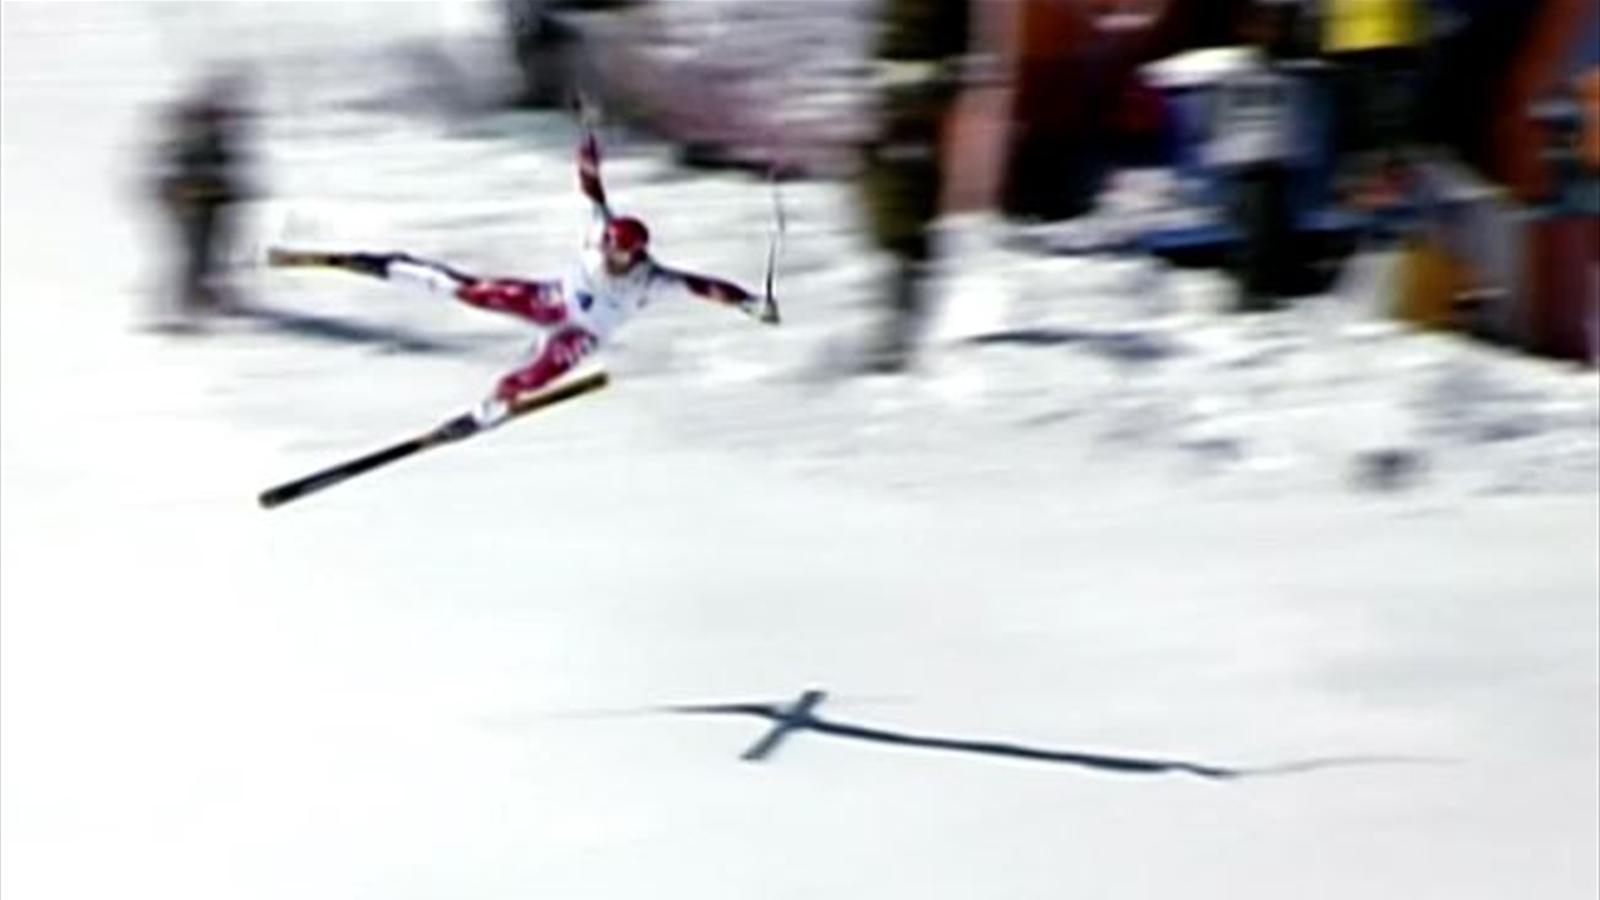 biathlon wm live